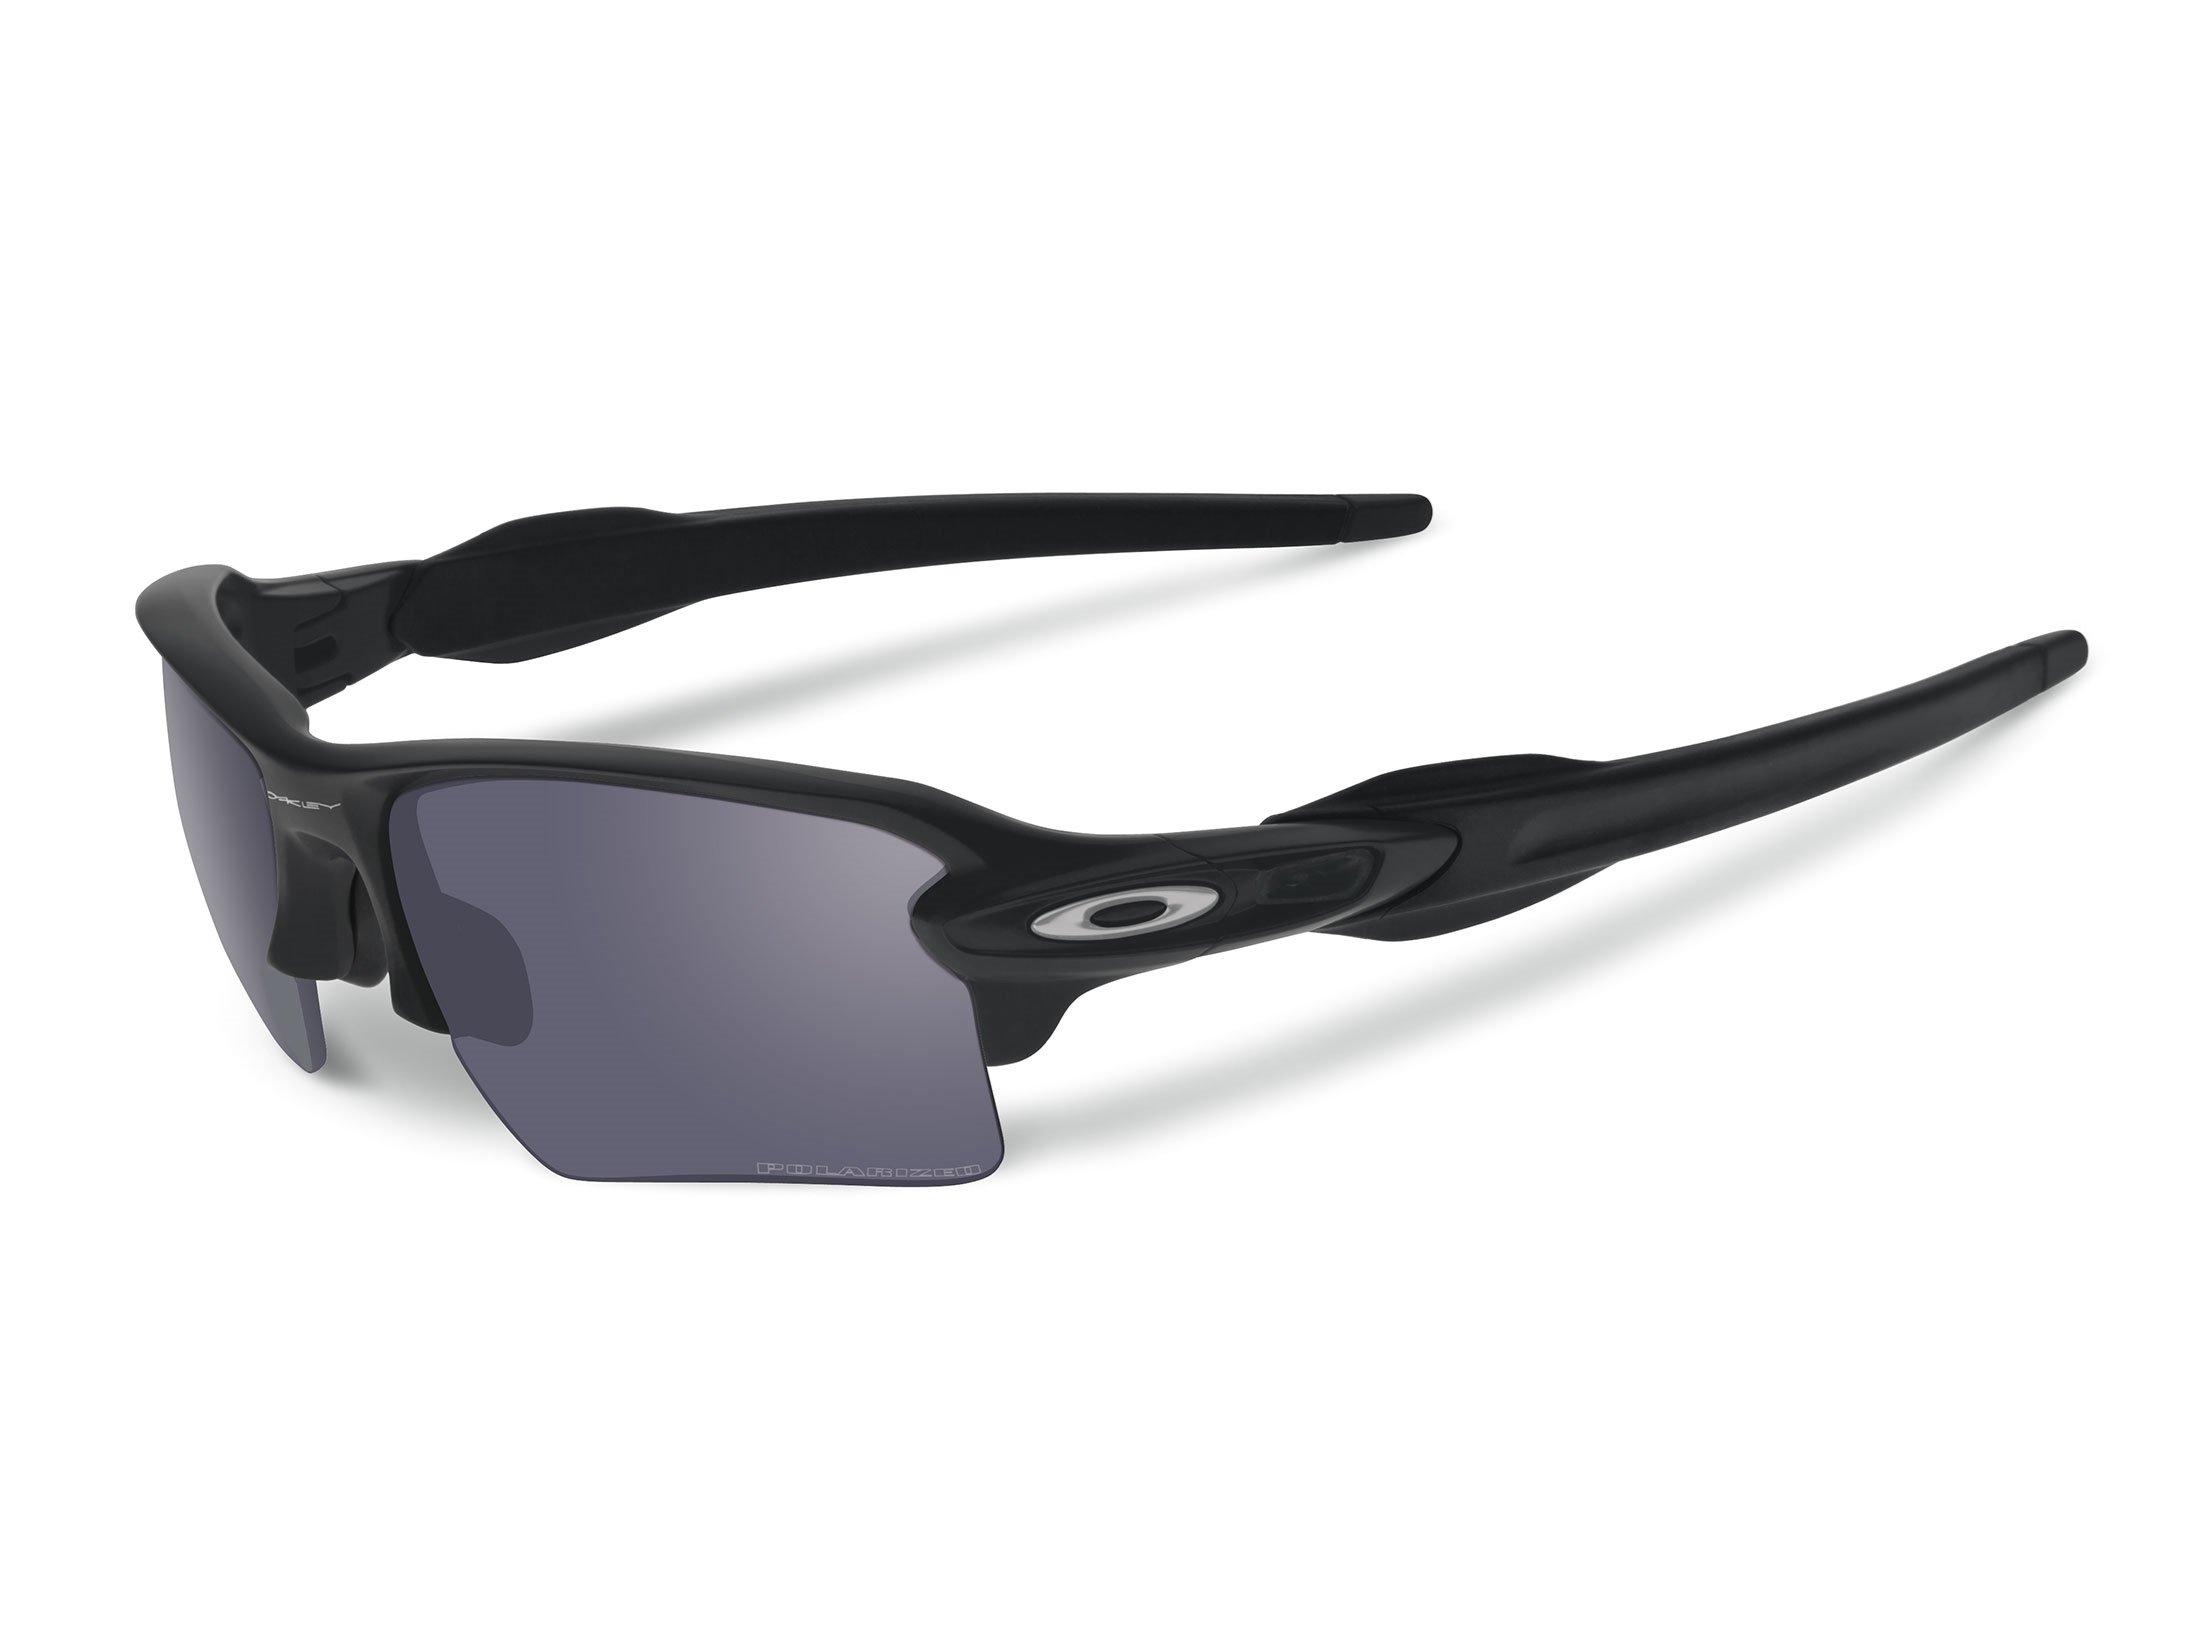 Oakley Mens Sunglasses Black/Grey - Polarized - 59mm